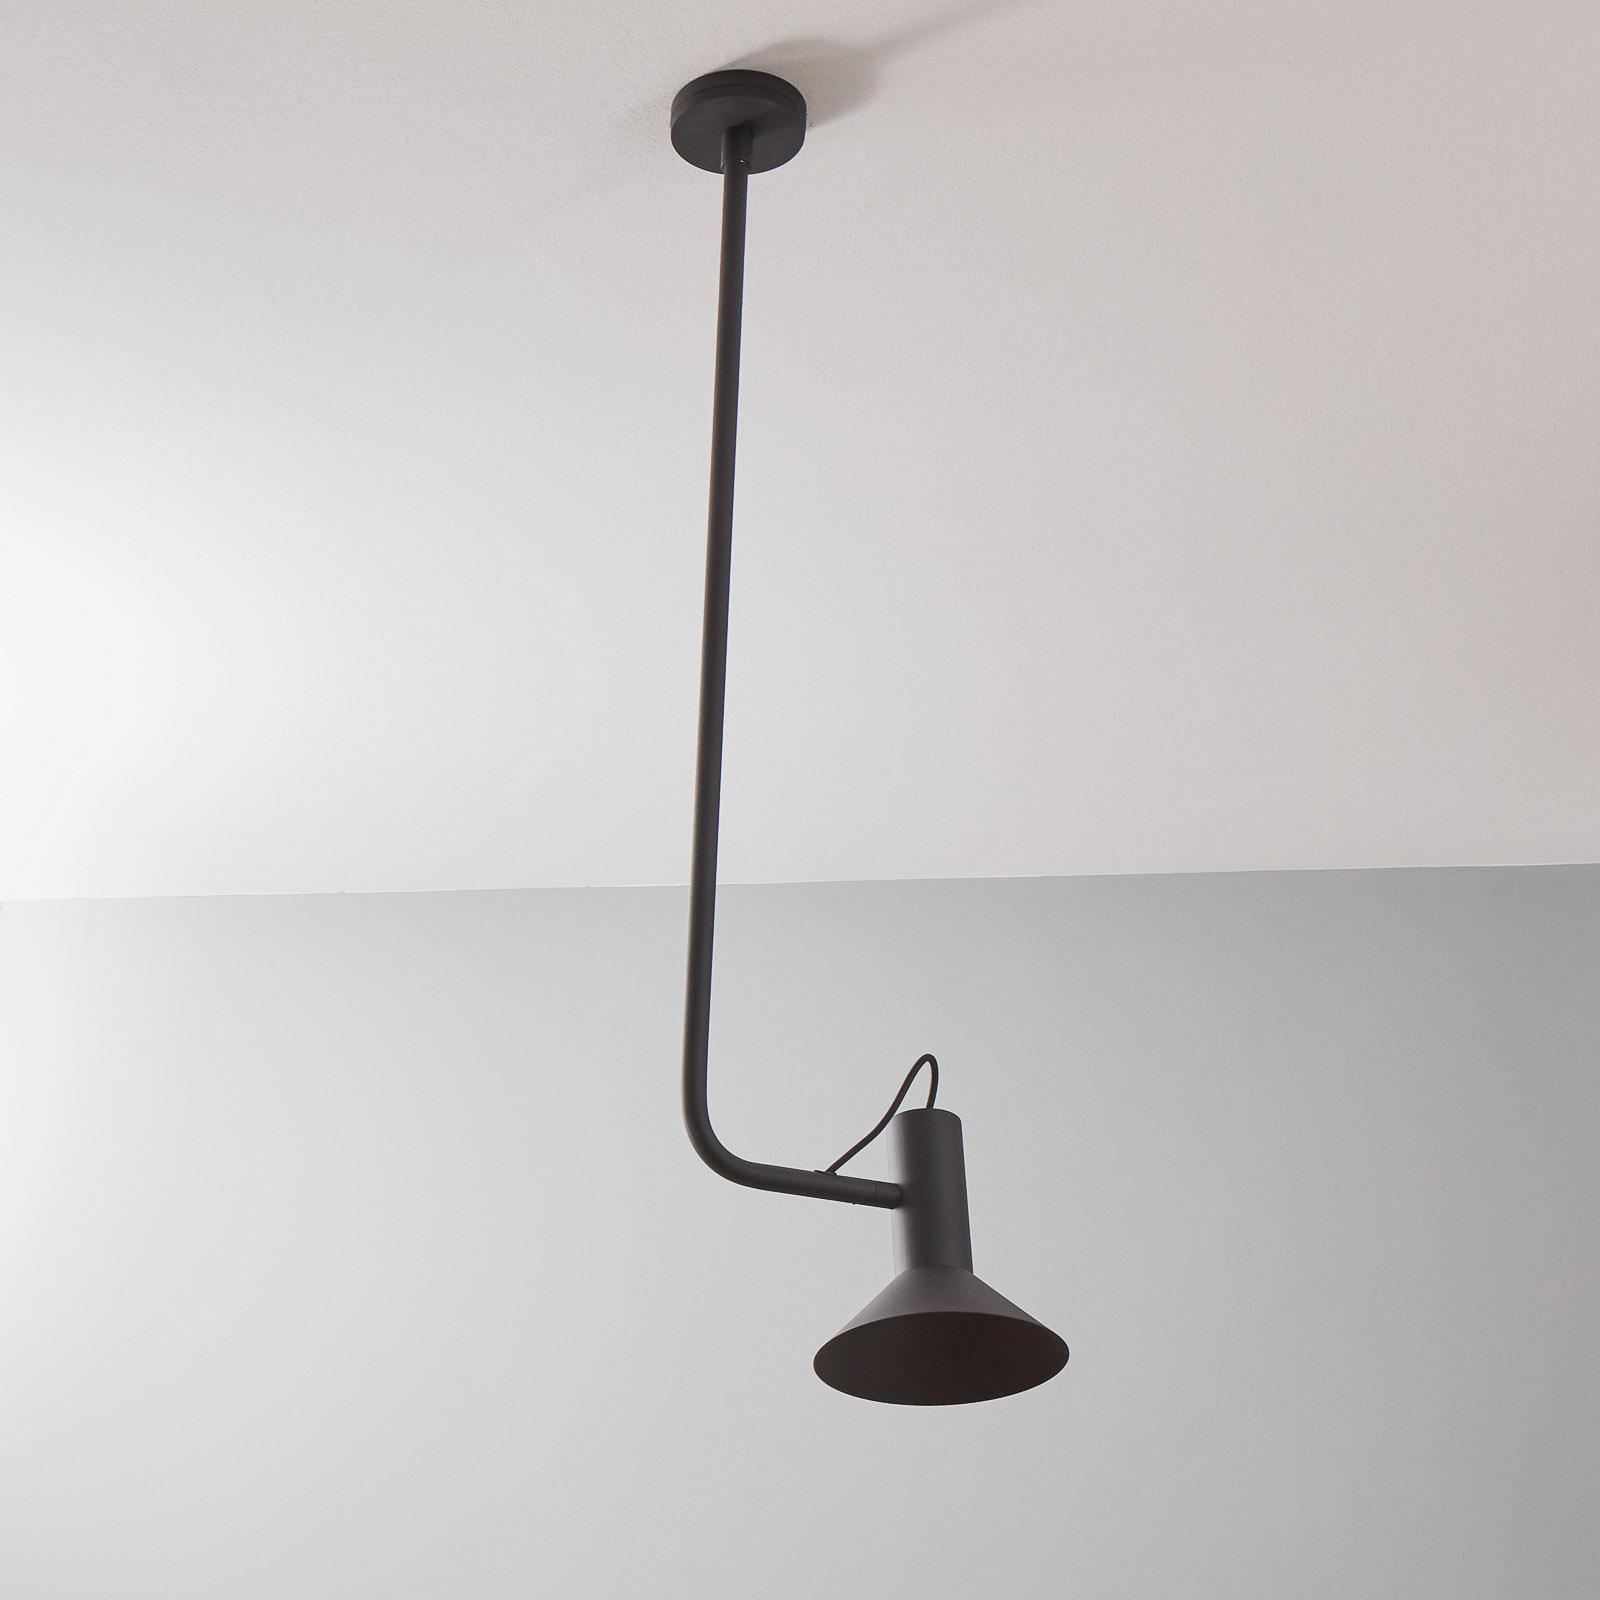 WEVER & DUCRÉ Roomor Hänge GU10 1fl 20,5cm schwarz